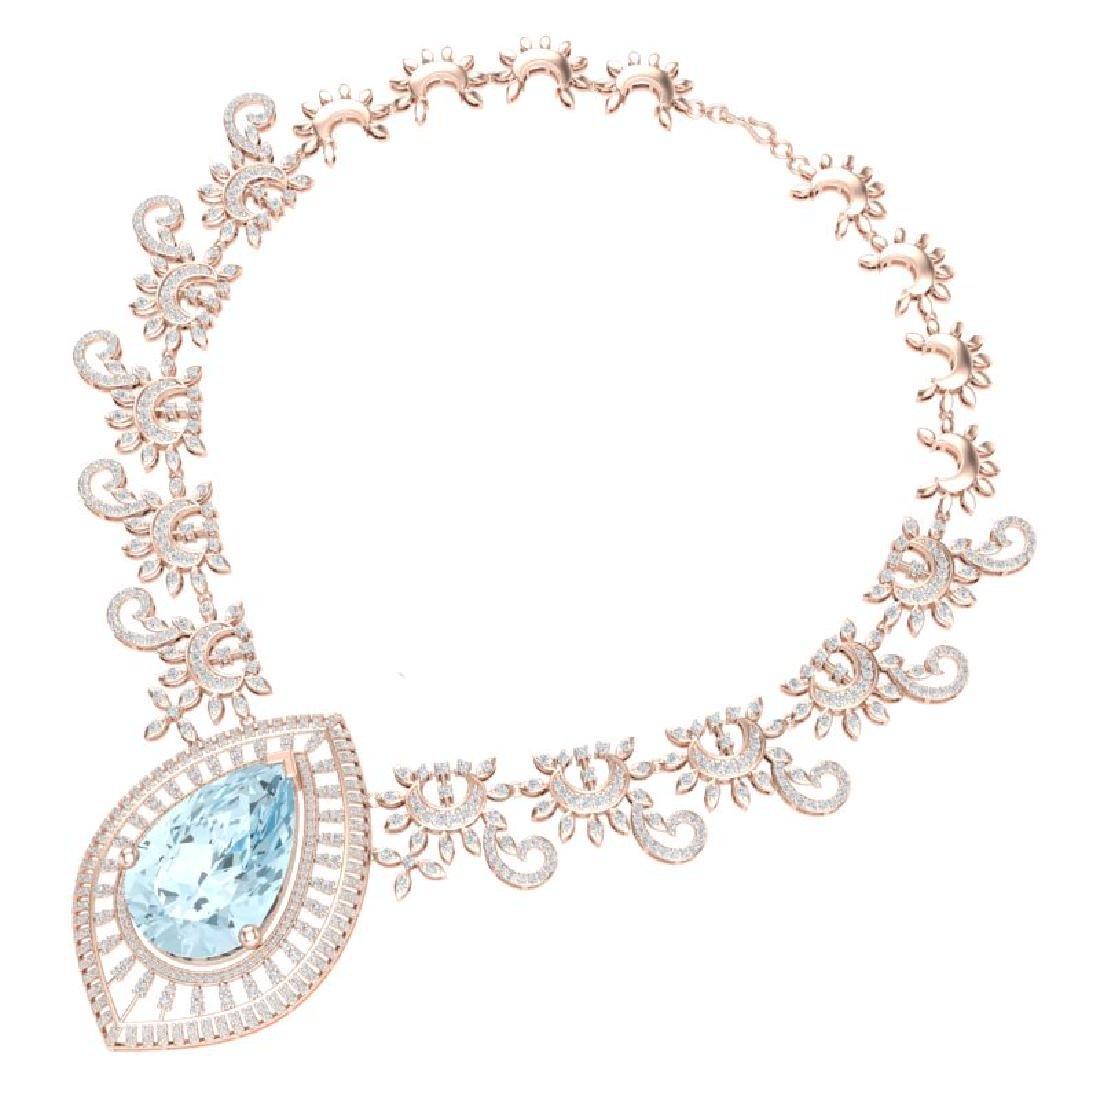 68.1 CTW Royalty Sky Topaz & VS Diamond Necklace 18K - 3